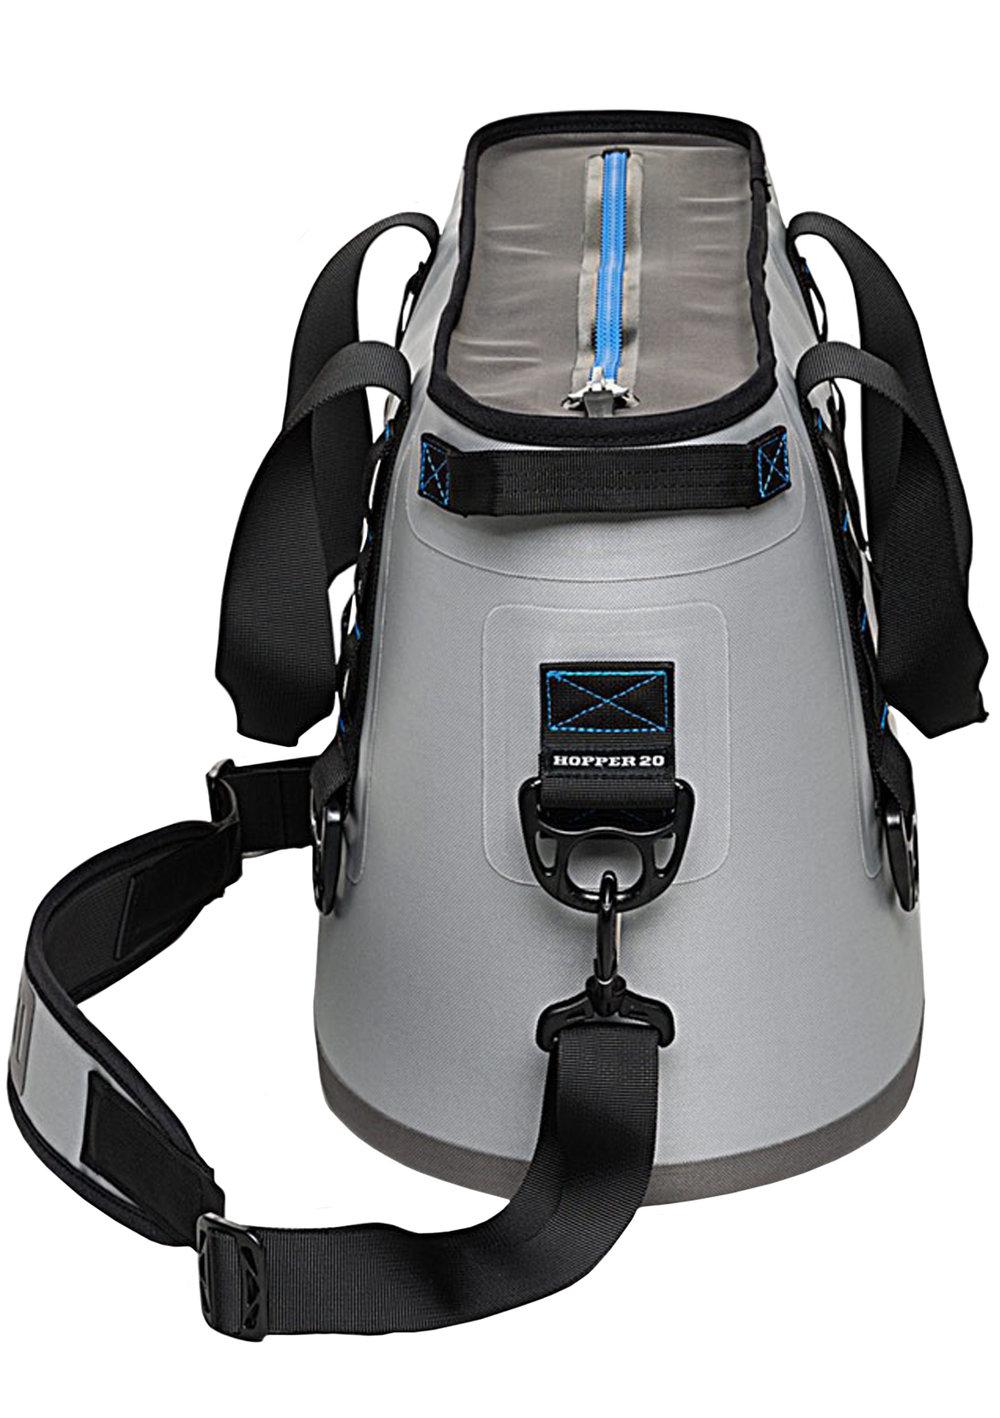 Yeti-Hopper-20-gear-camping-cooler-03.jpg